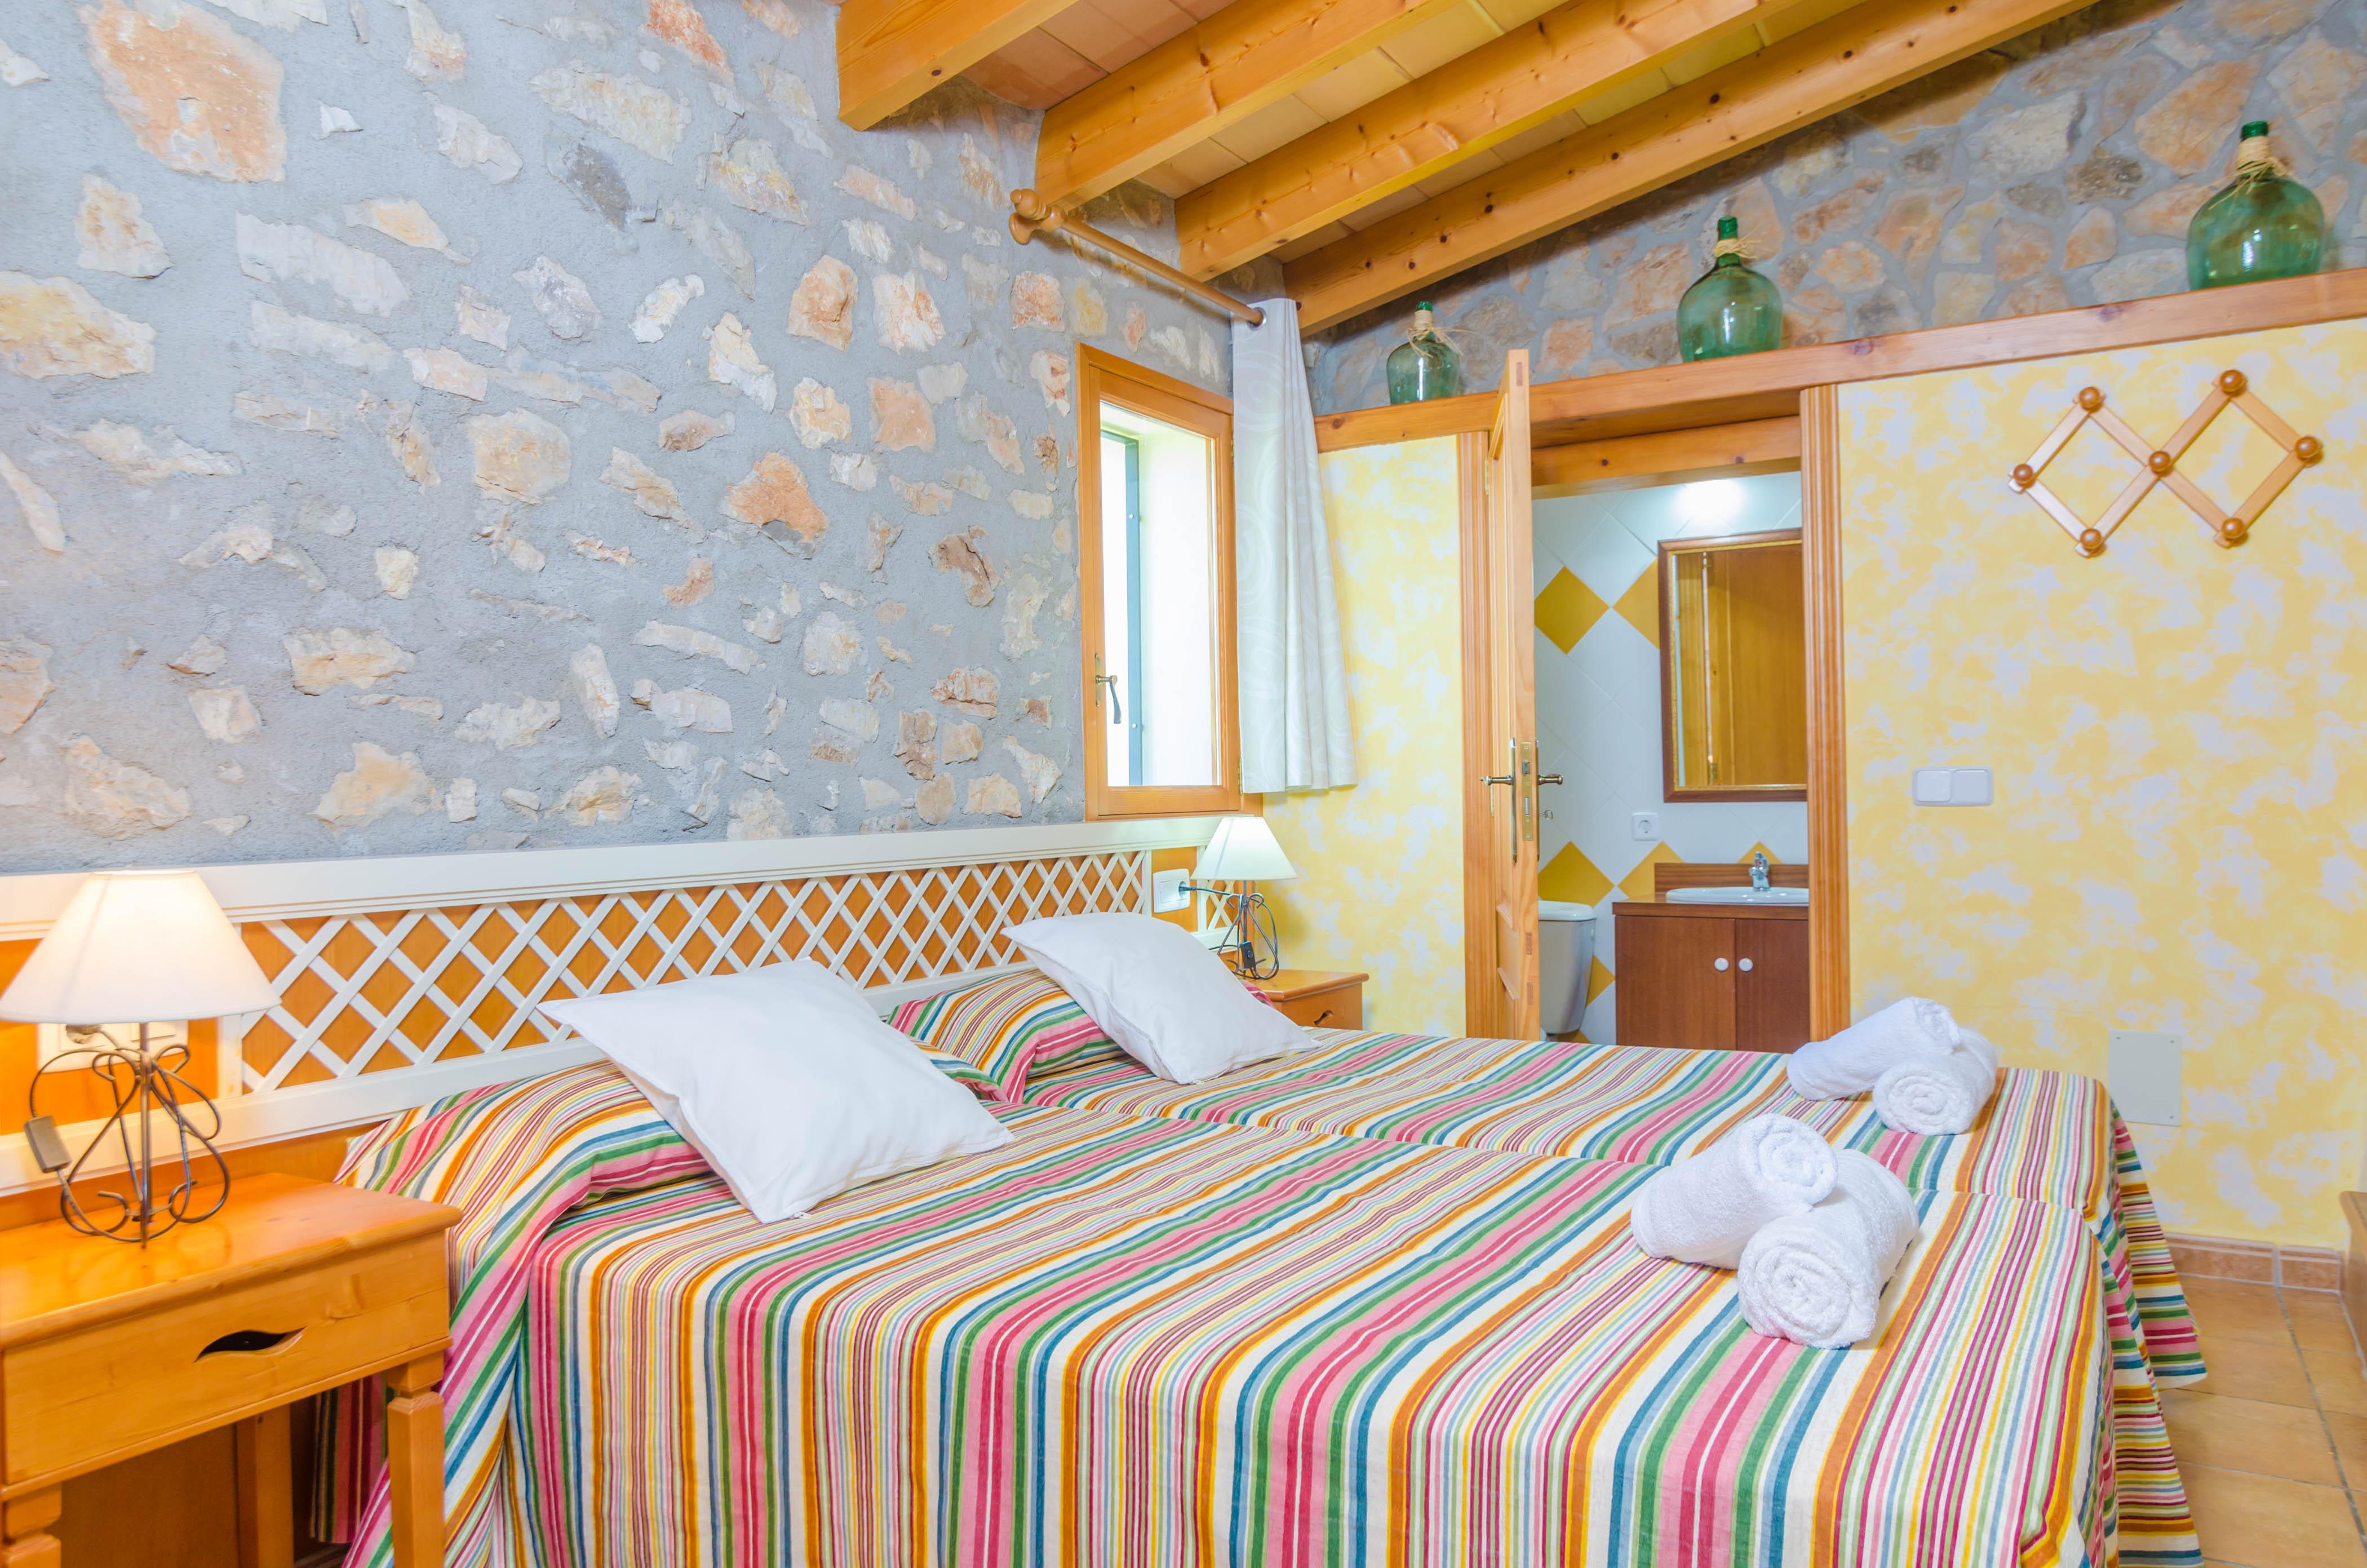 Ferienhaus SON MACIA (2186582), Son Macià, Mallorca, Balearische Inseln, Spanien, Bild 23